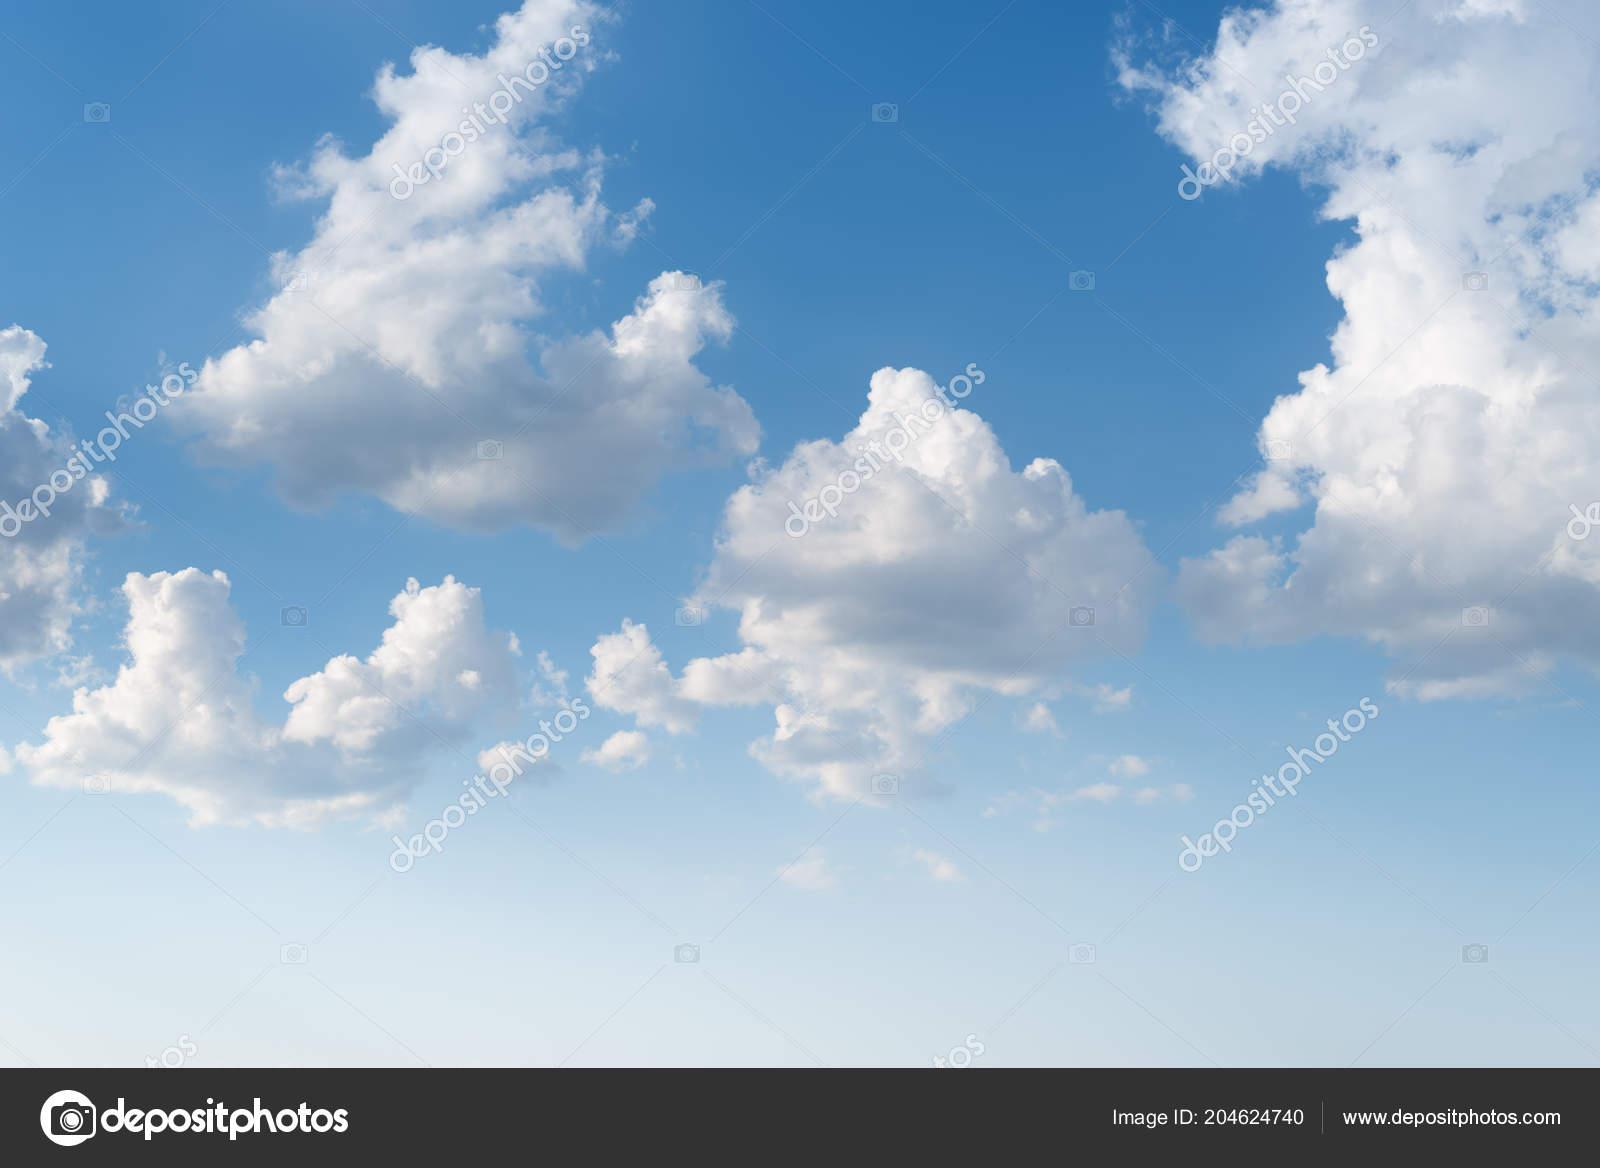 white cumulus clouds blue sky heaven collage ストック写真